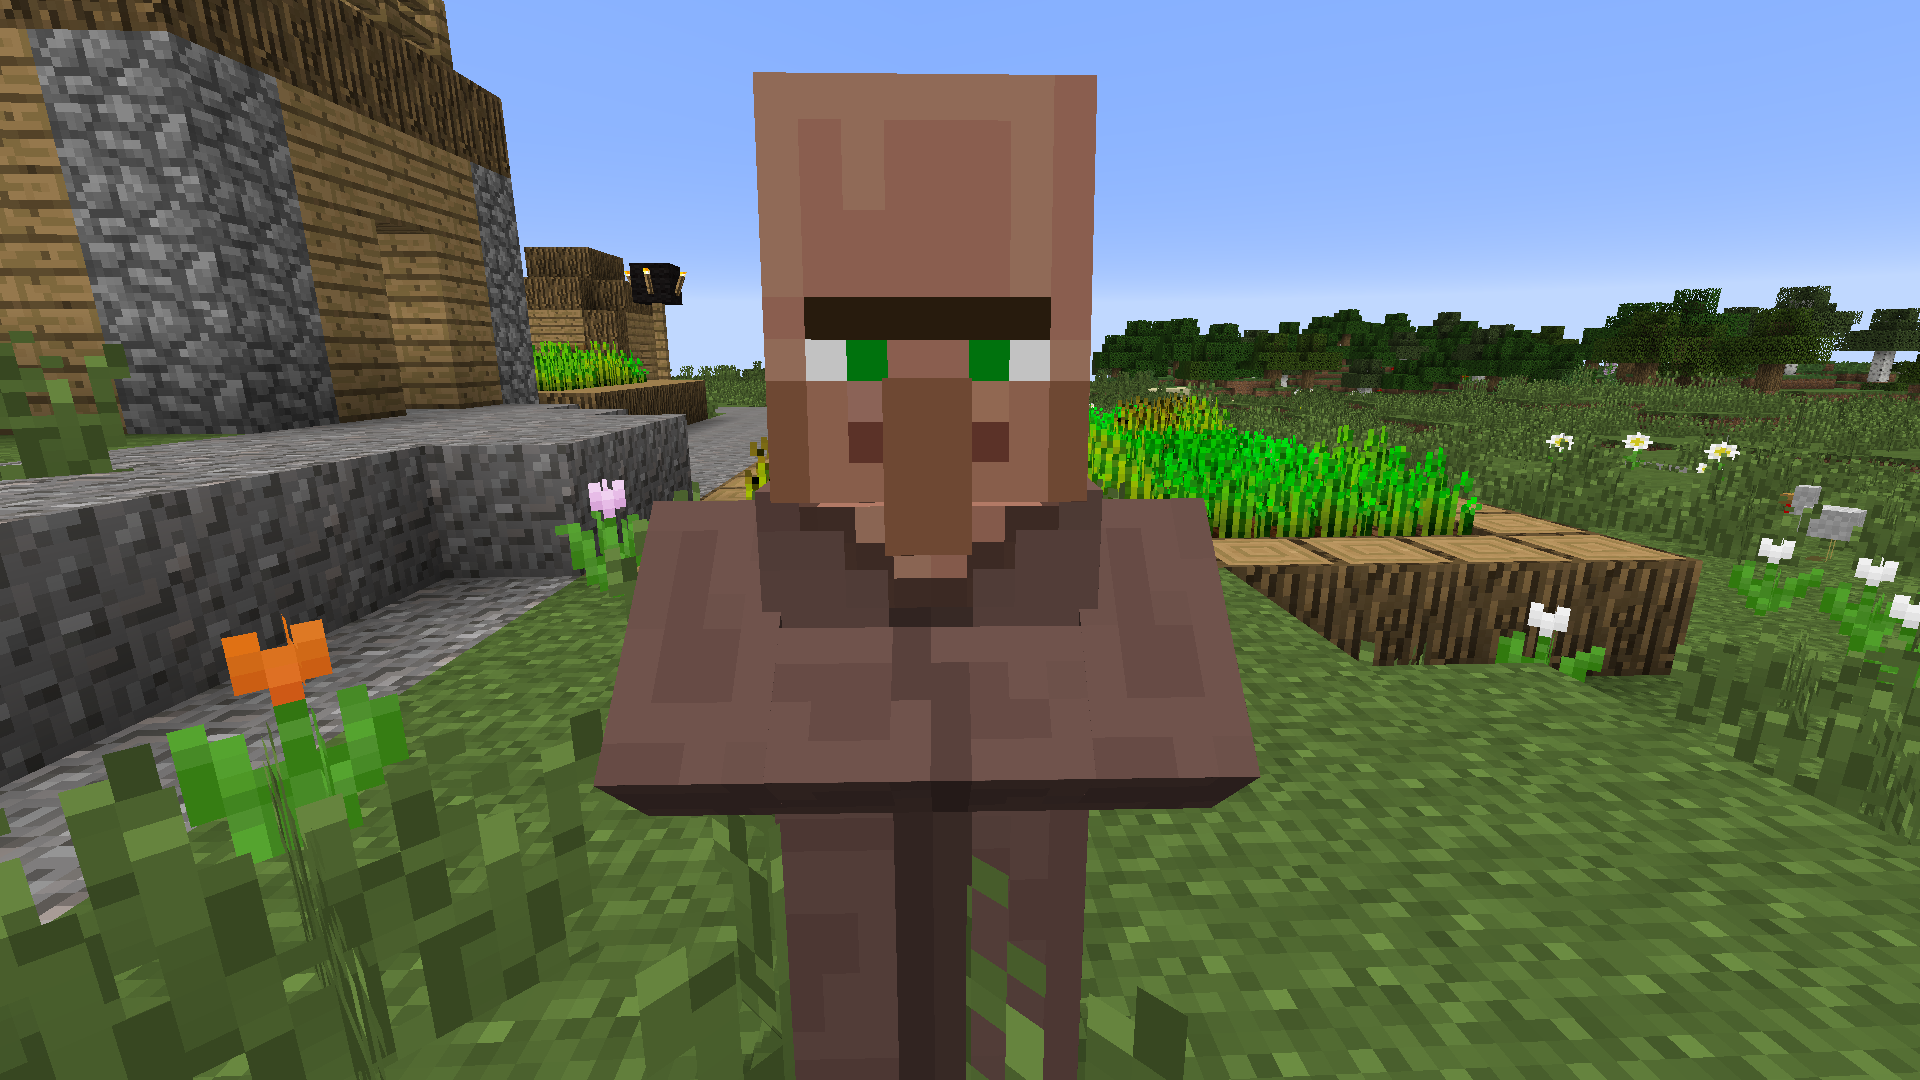 minecraft how to make villagers spawn